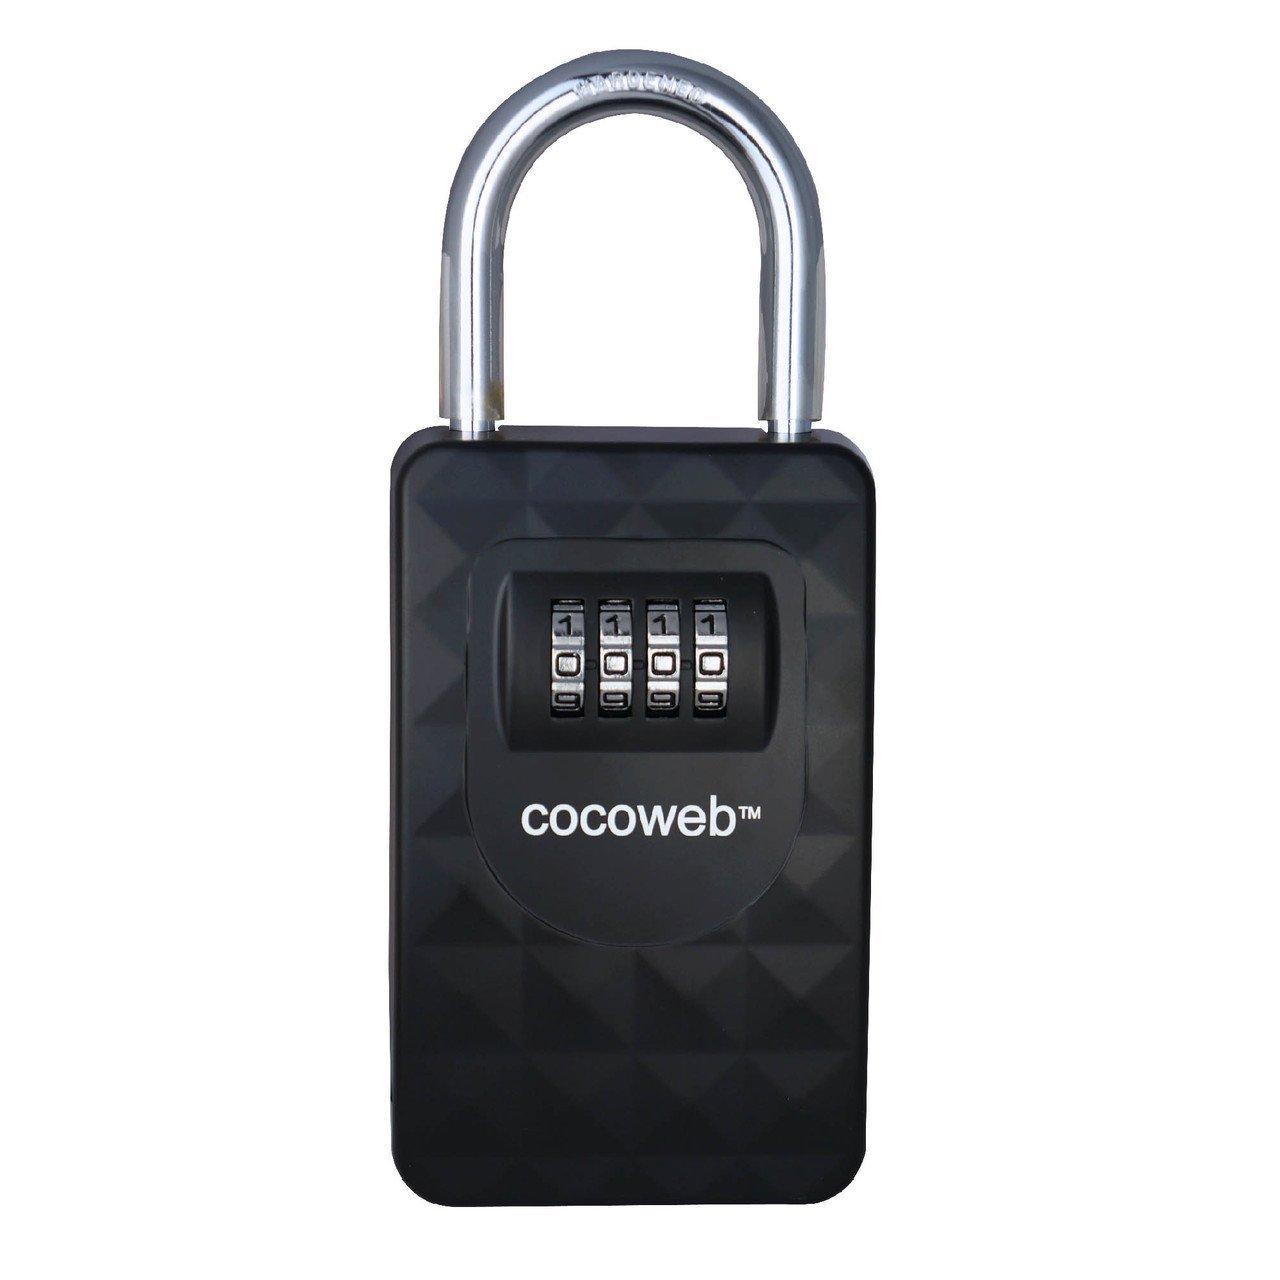 Cocoweb HKPV-S | Heavy duty combination storage lock box - Hanging Shackle, Black